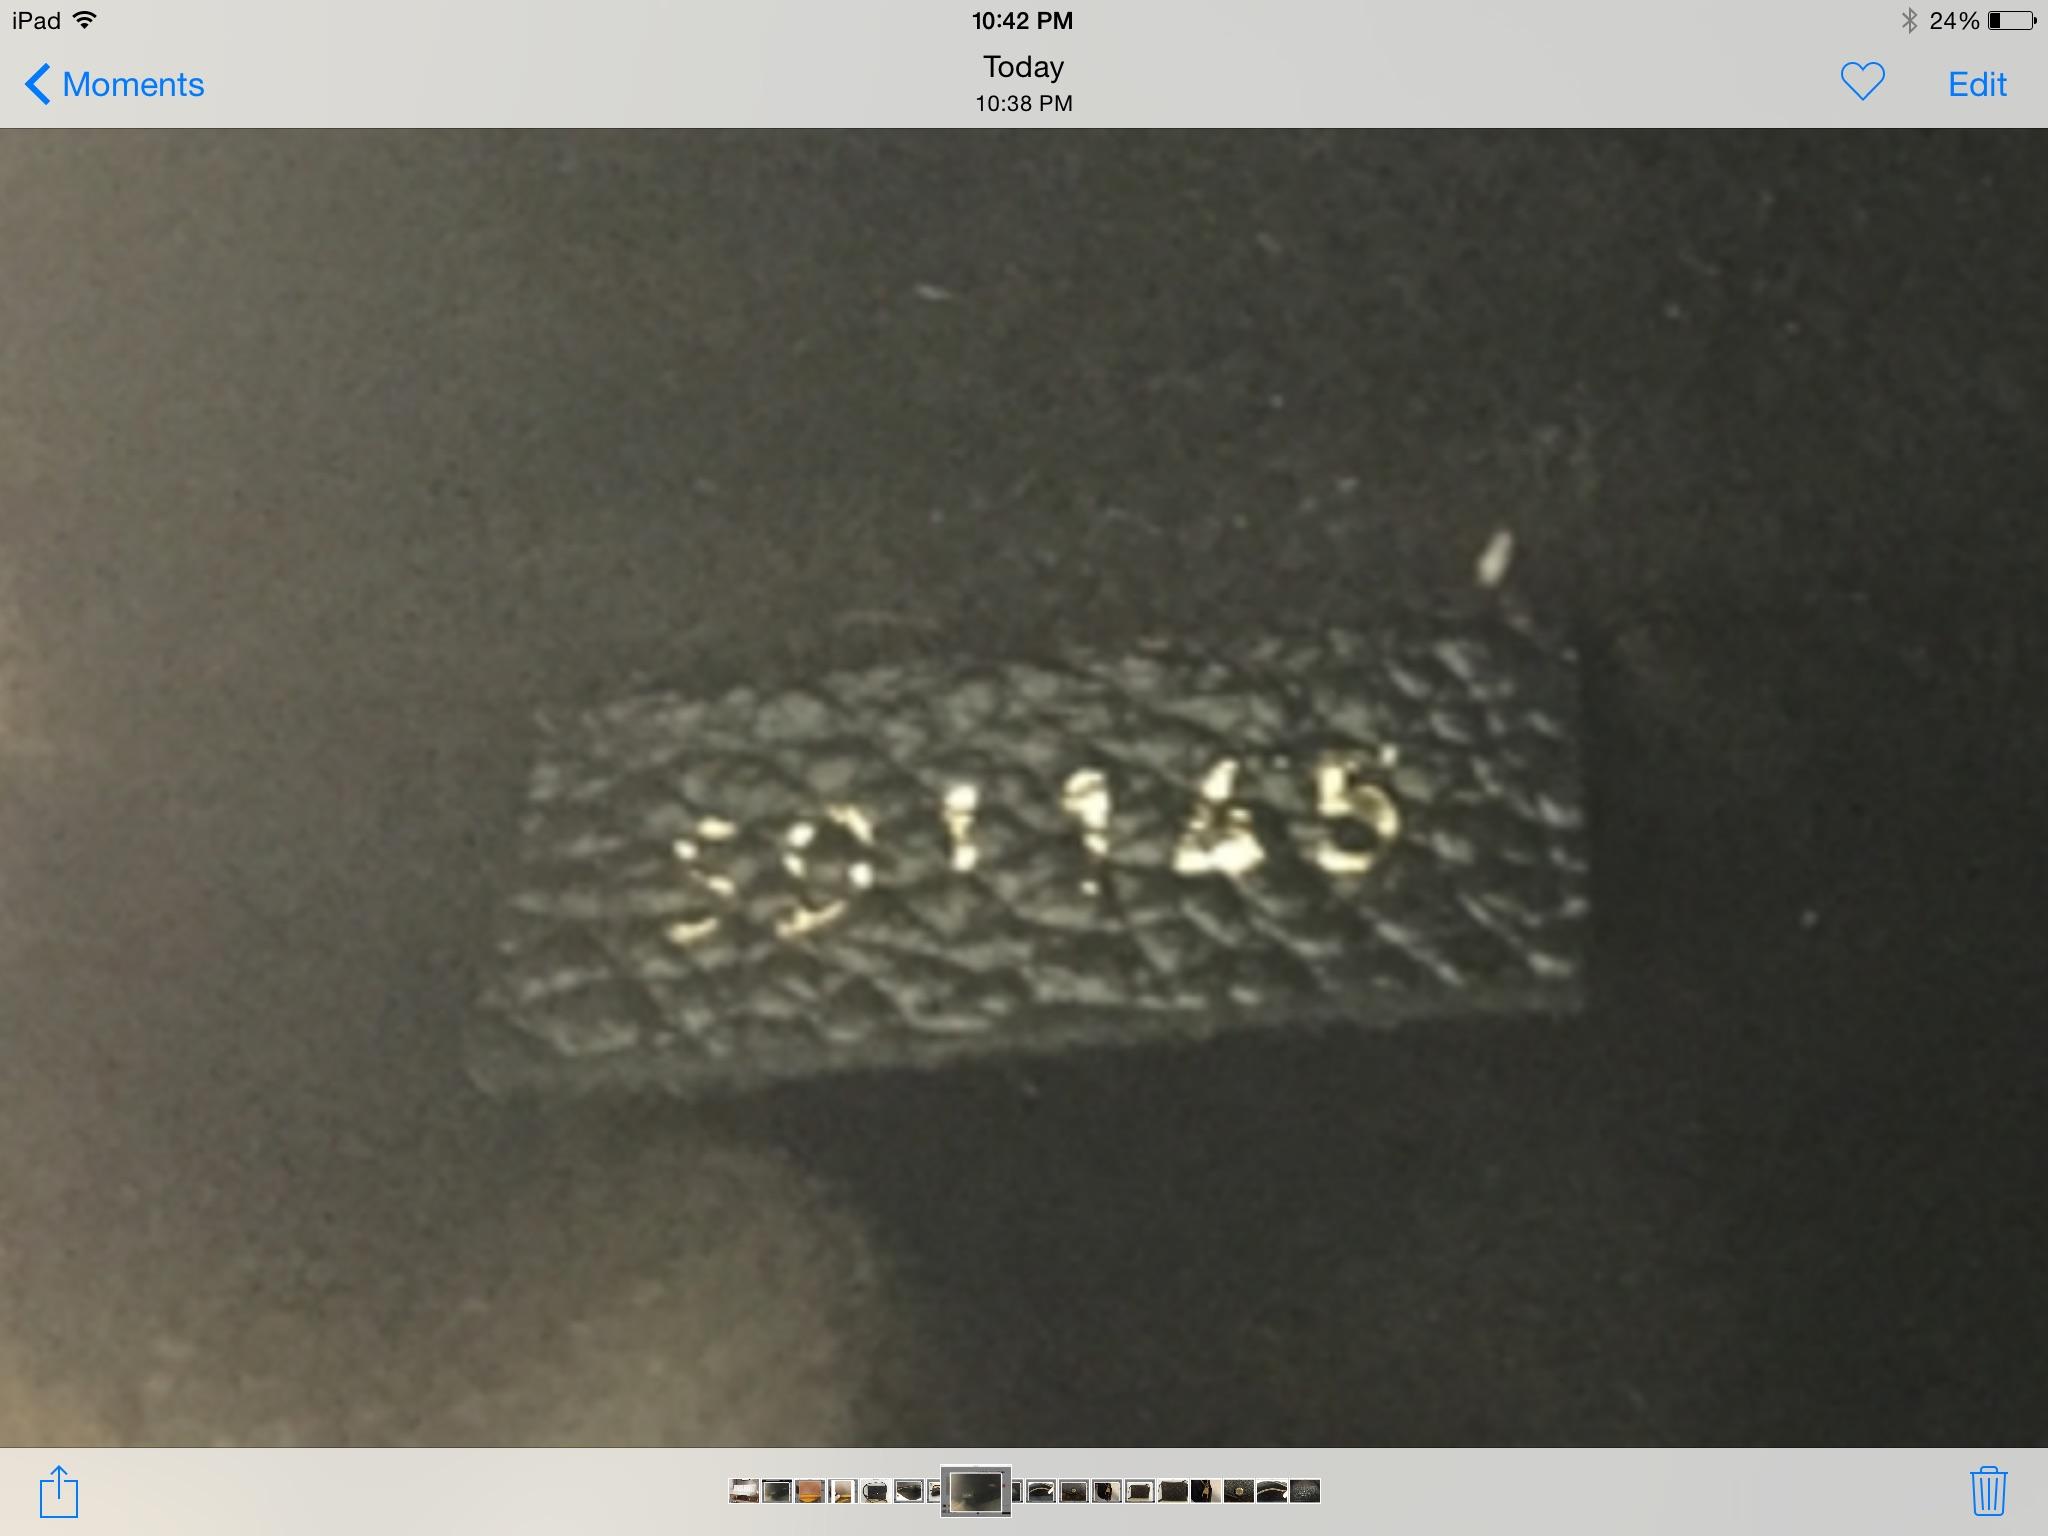 Easy Louis Vuitton Bag Authentication Guide Lollipuff >> Louis Vuitton Date Code Guide Lollipuff